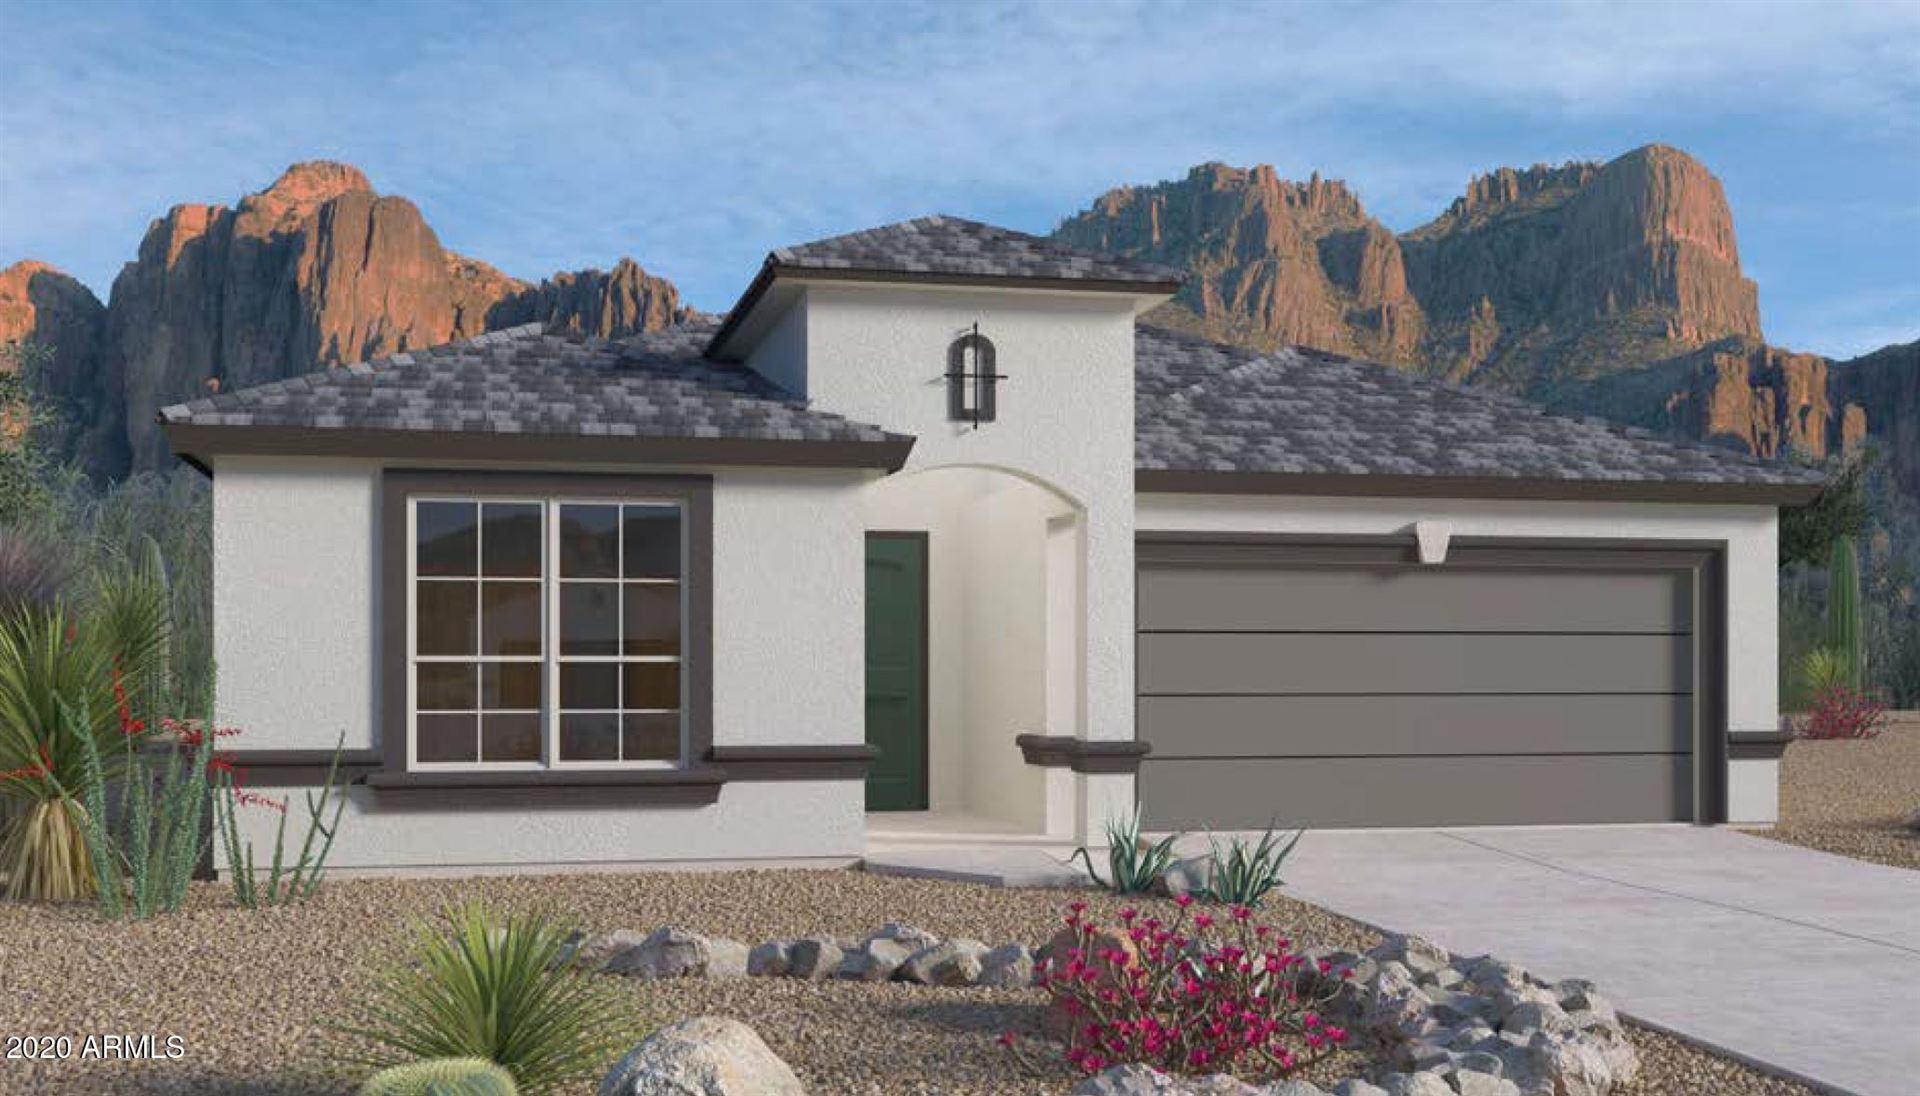 38102 W SANTA MARIA Street, Maricopa, AZ 85138 - MLS#: 6174305